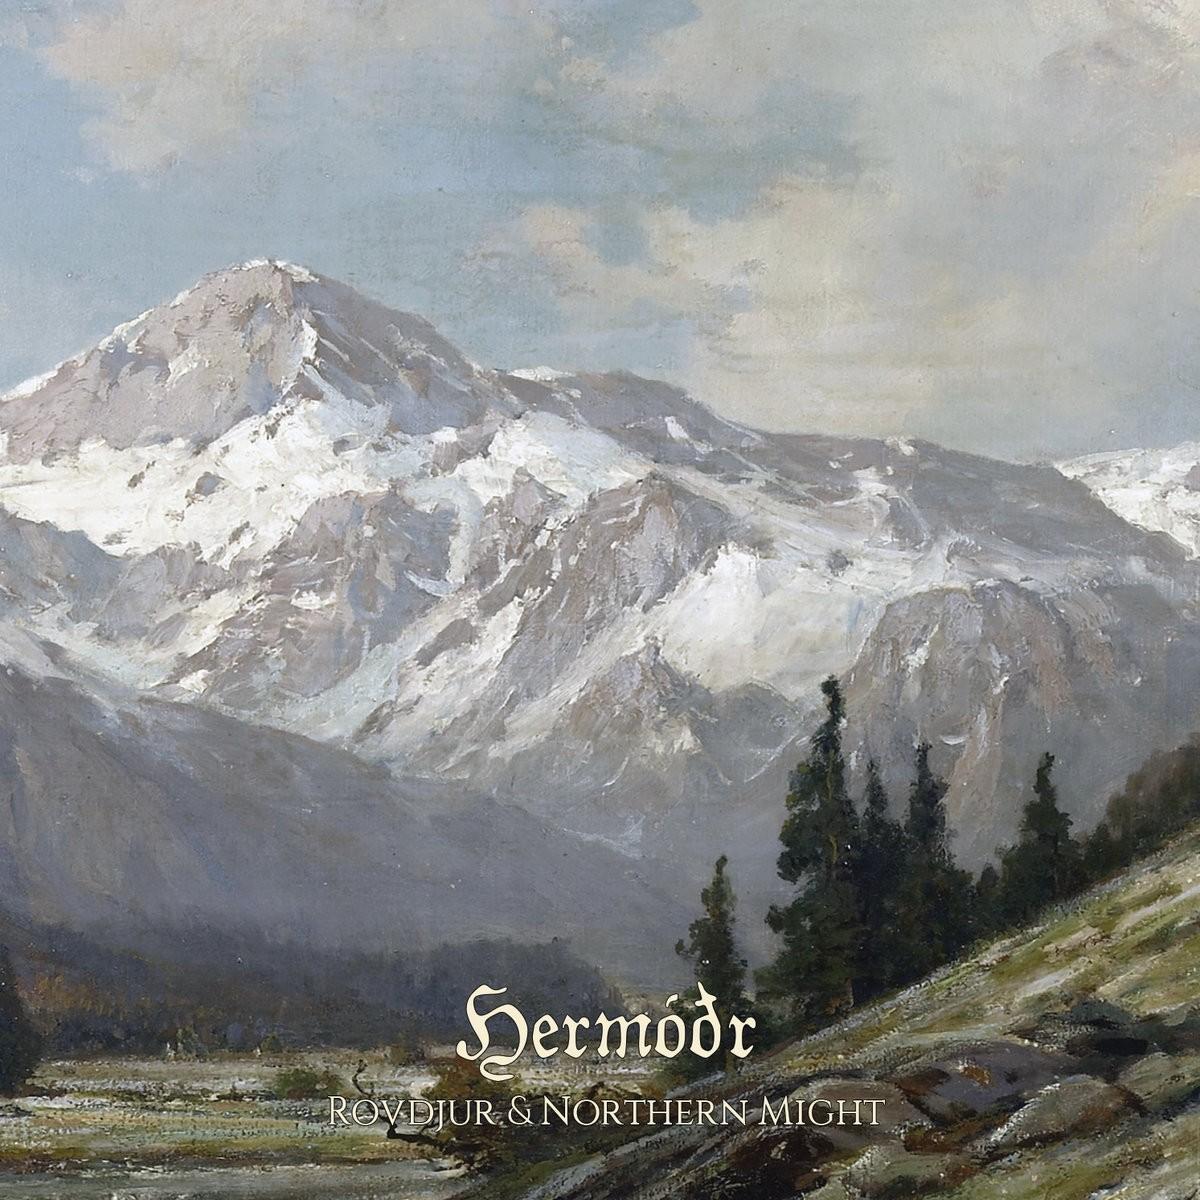 HERMODR - Rovdjur & Northern Might DigiPak CD